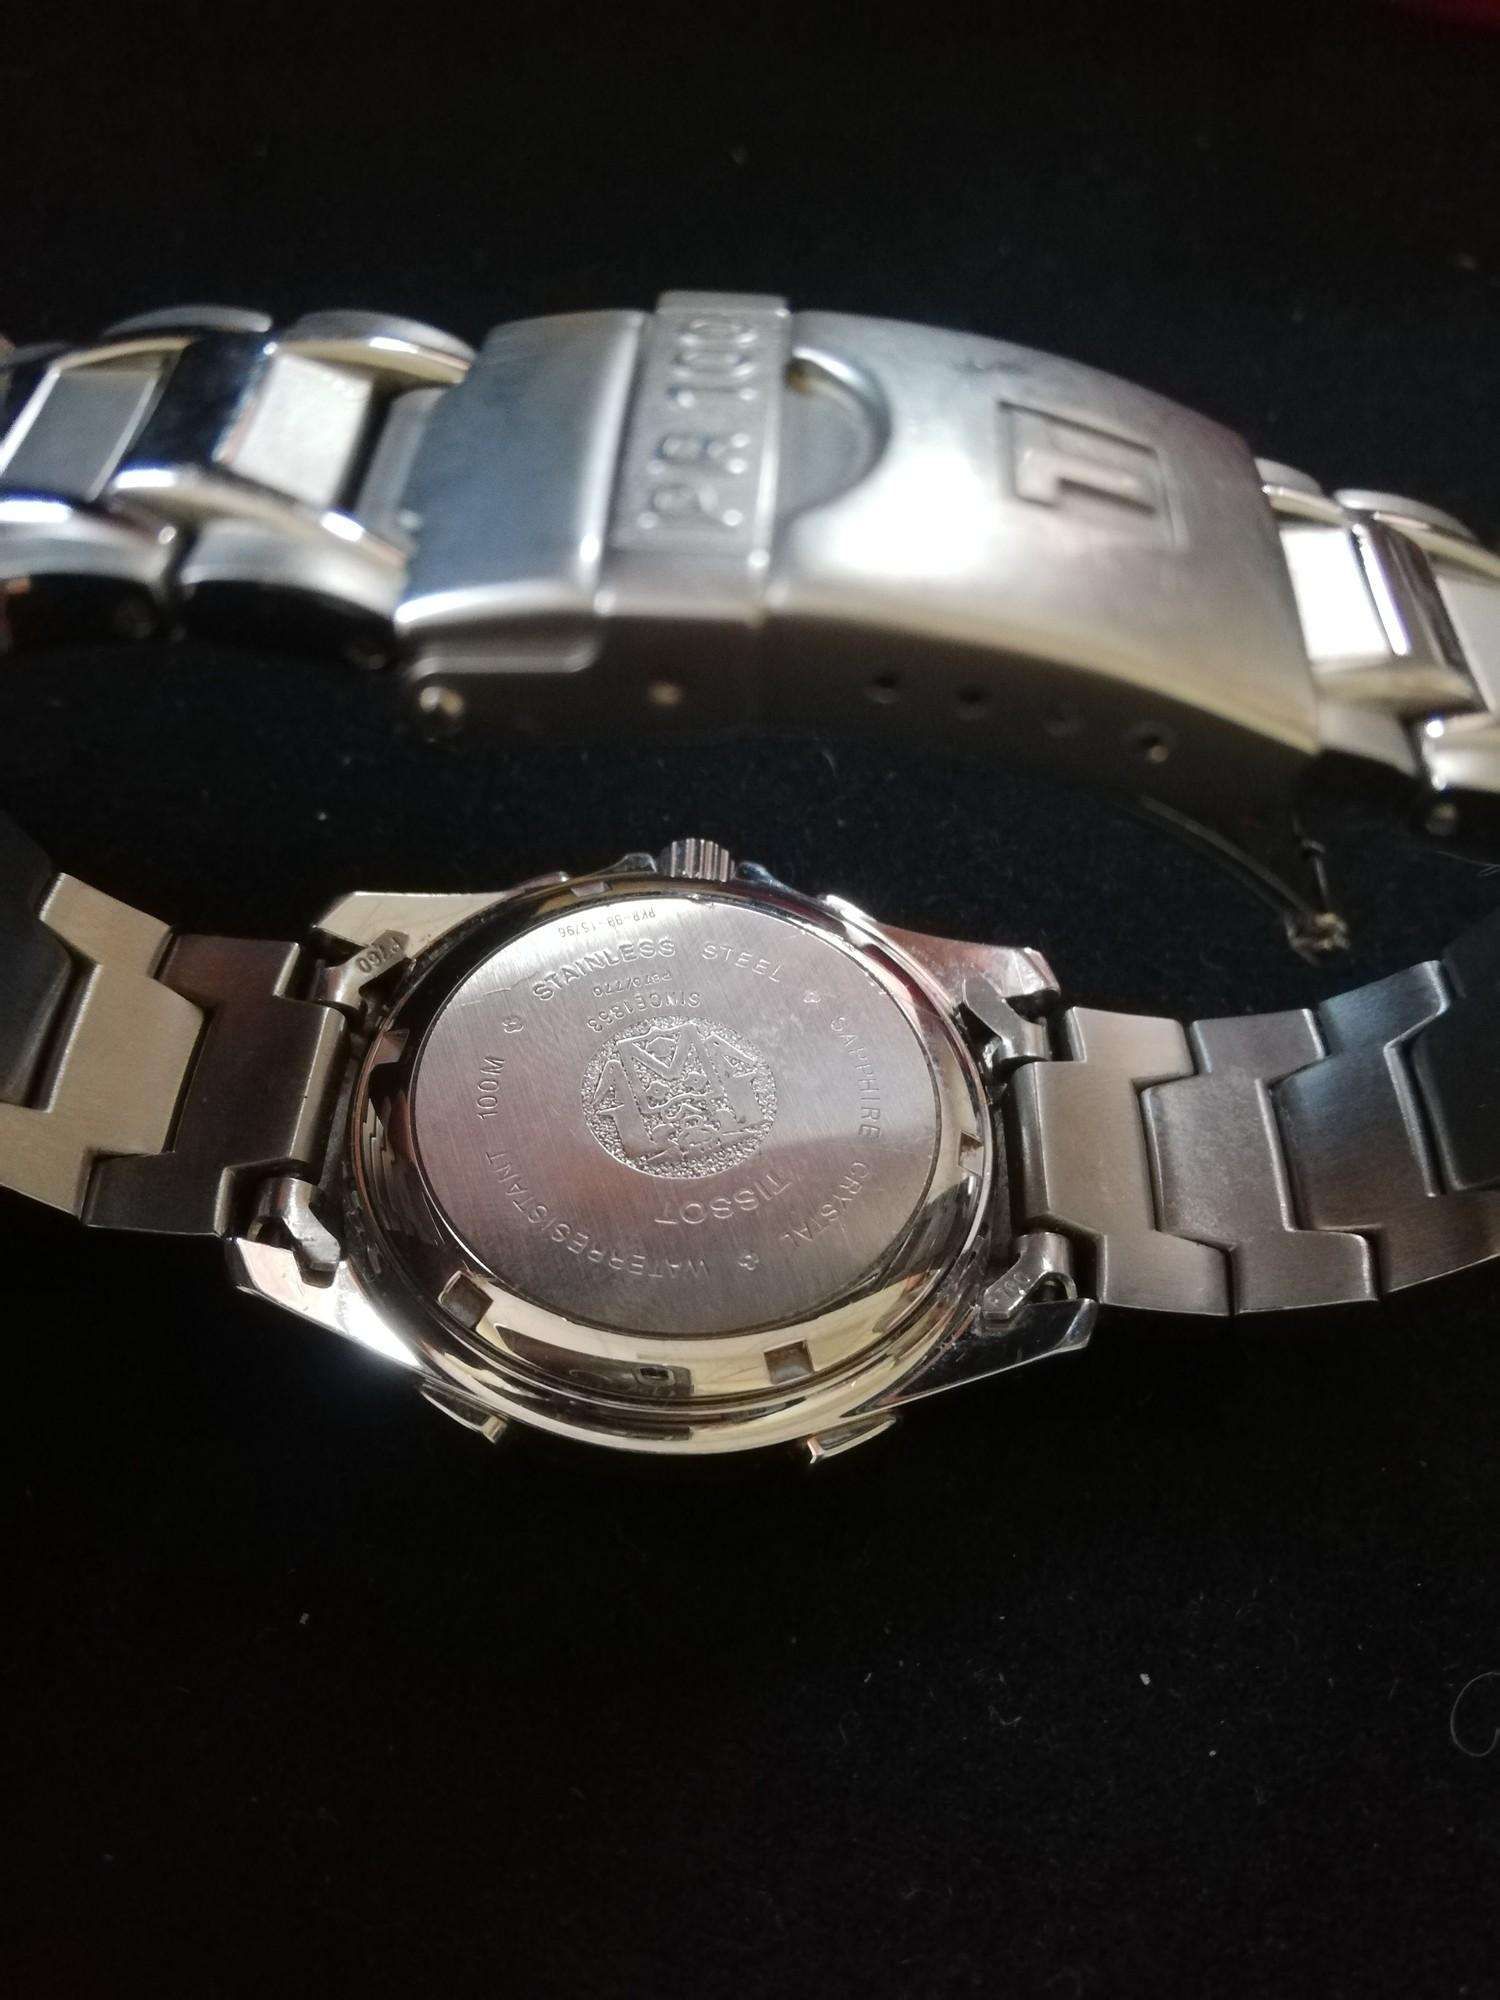 Tissot gents stainless steel PR100 chrono alarm wristwatch -in running order - Image 3 of 3